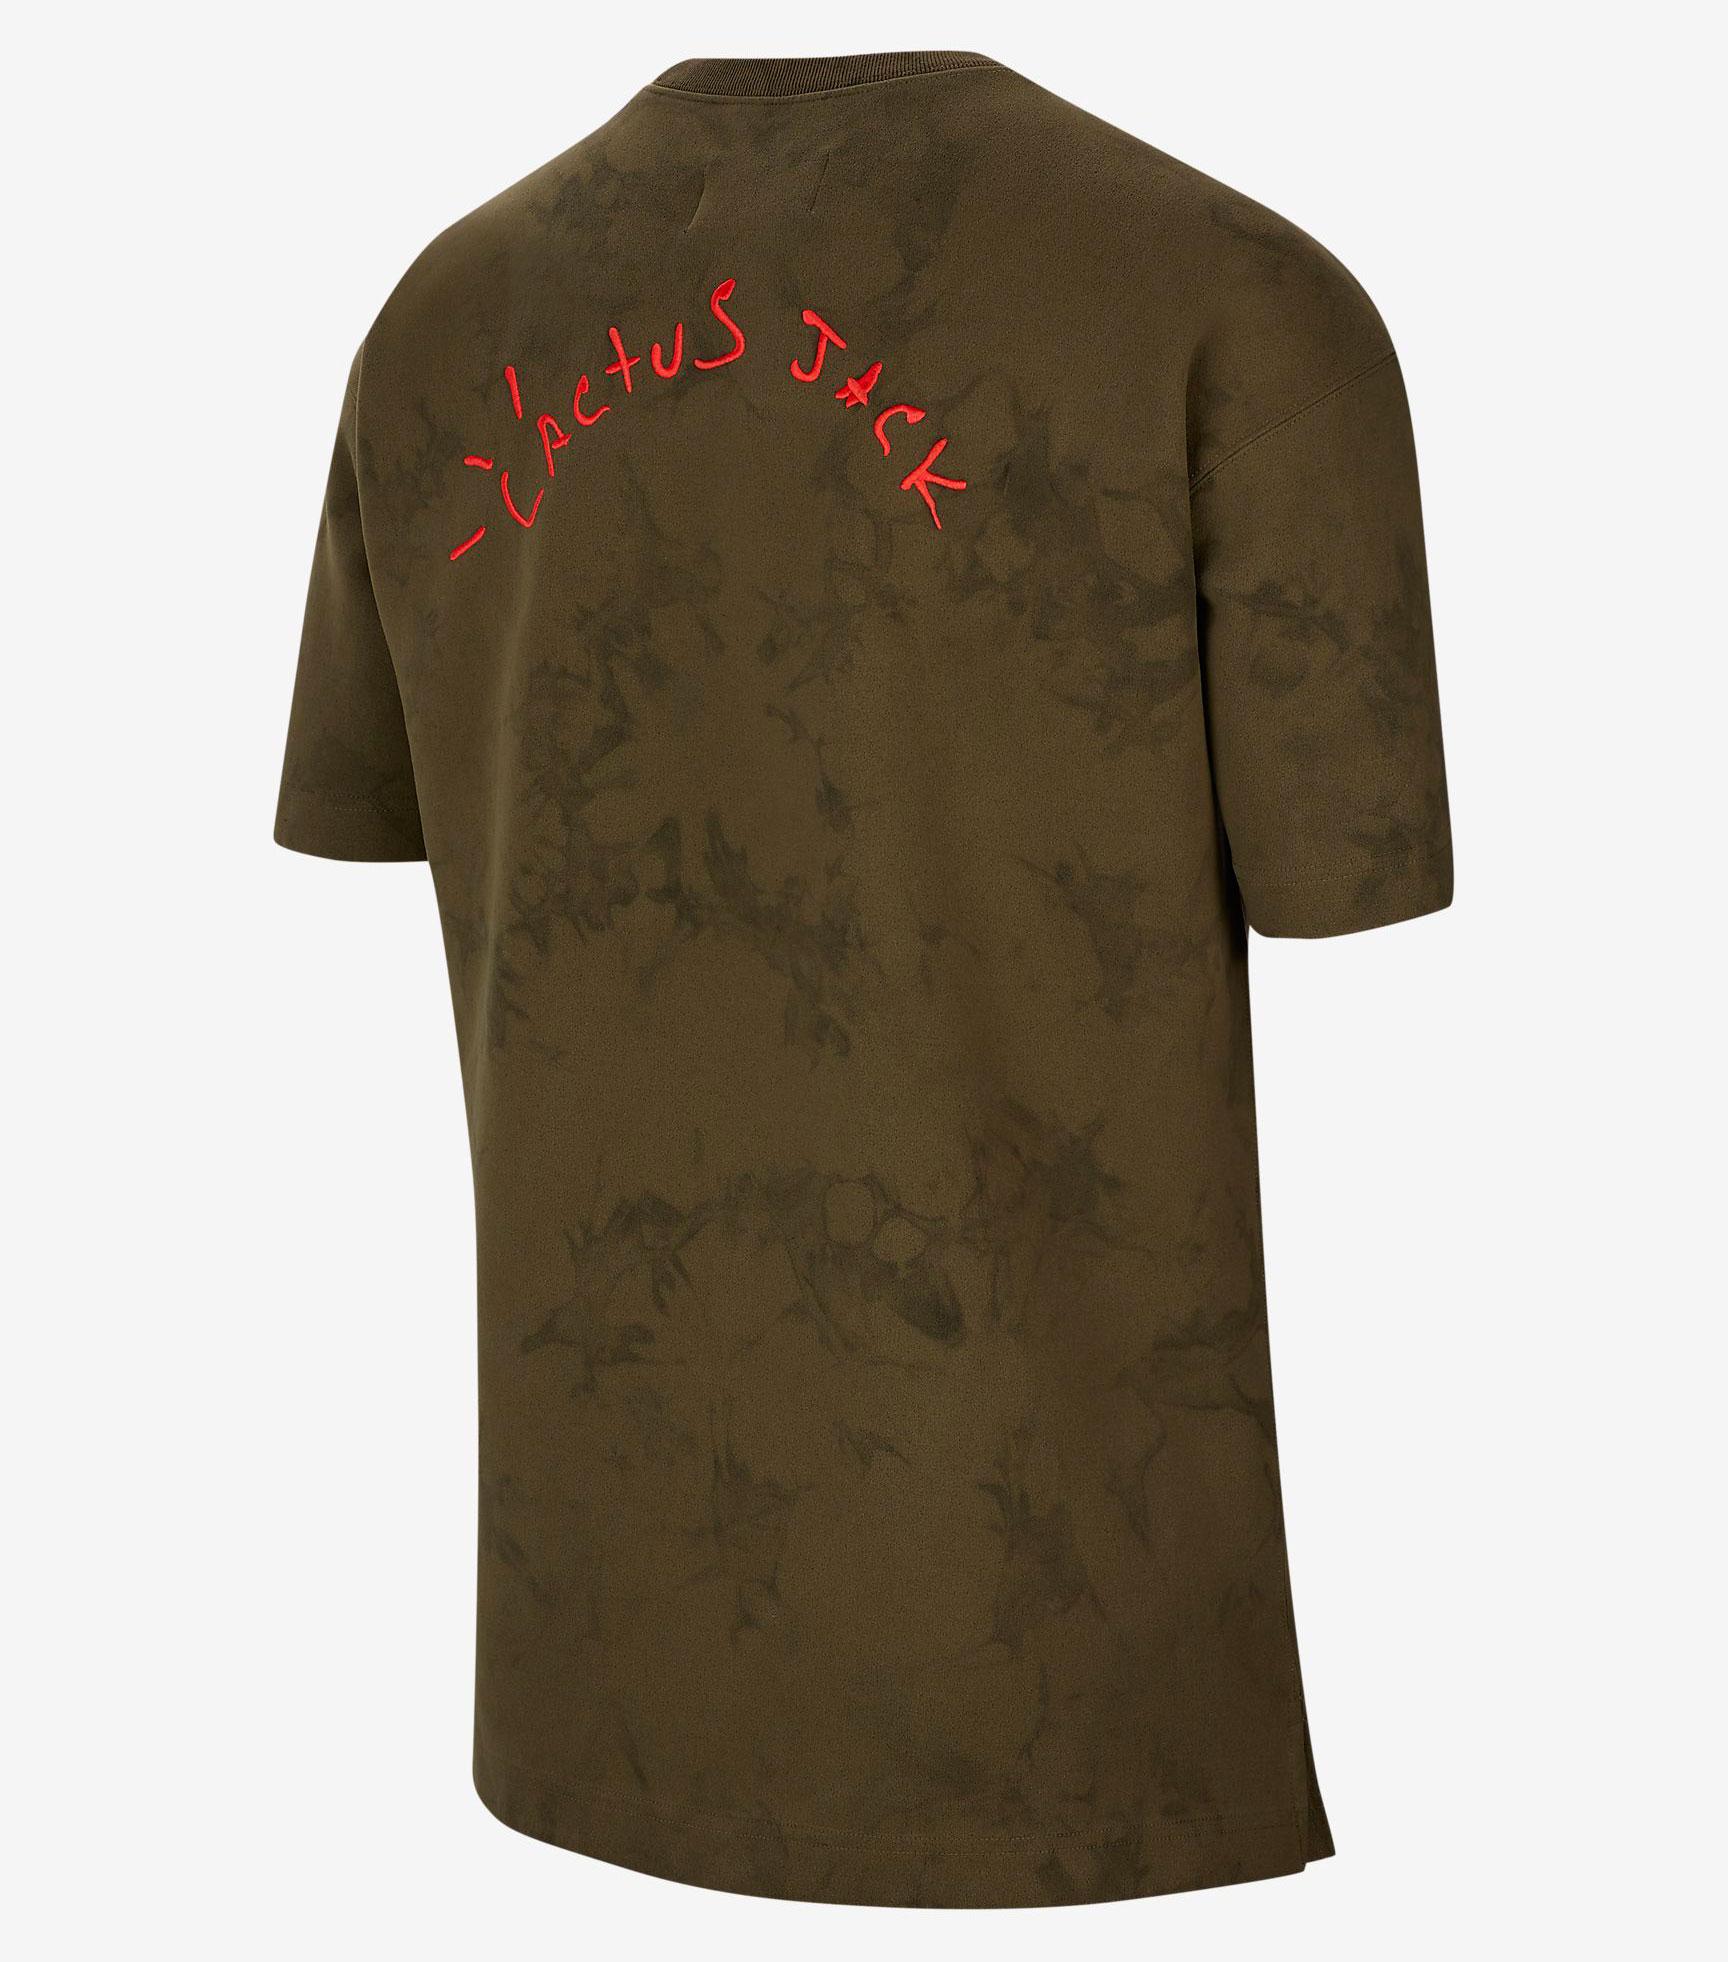 travis-scott-air-jordan-6-olive-shirt-3